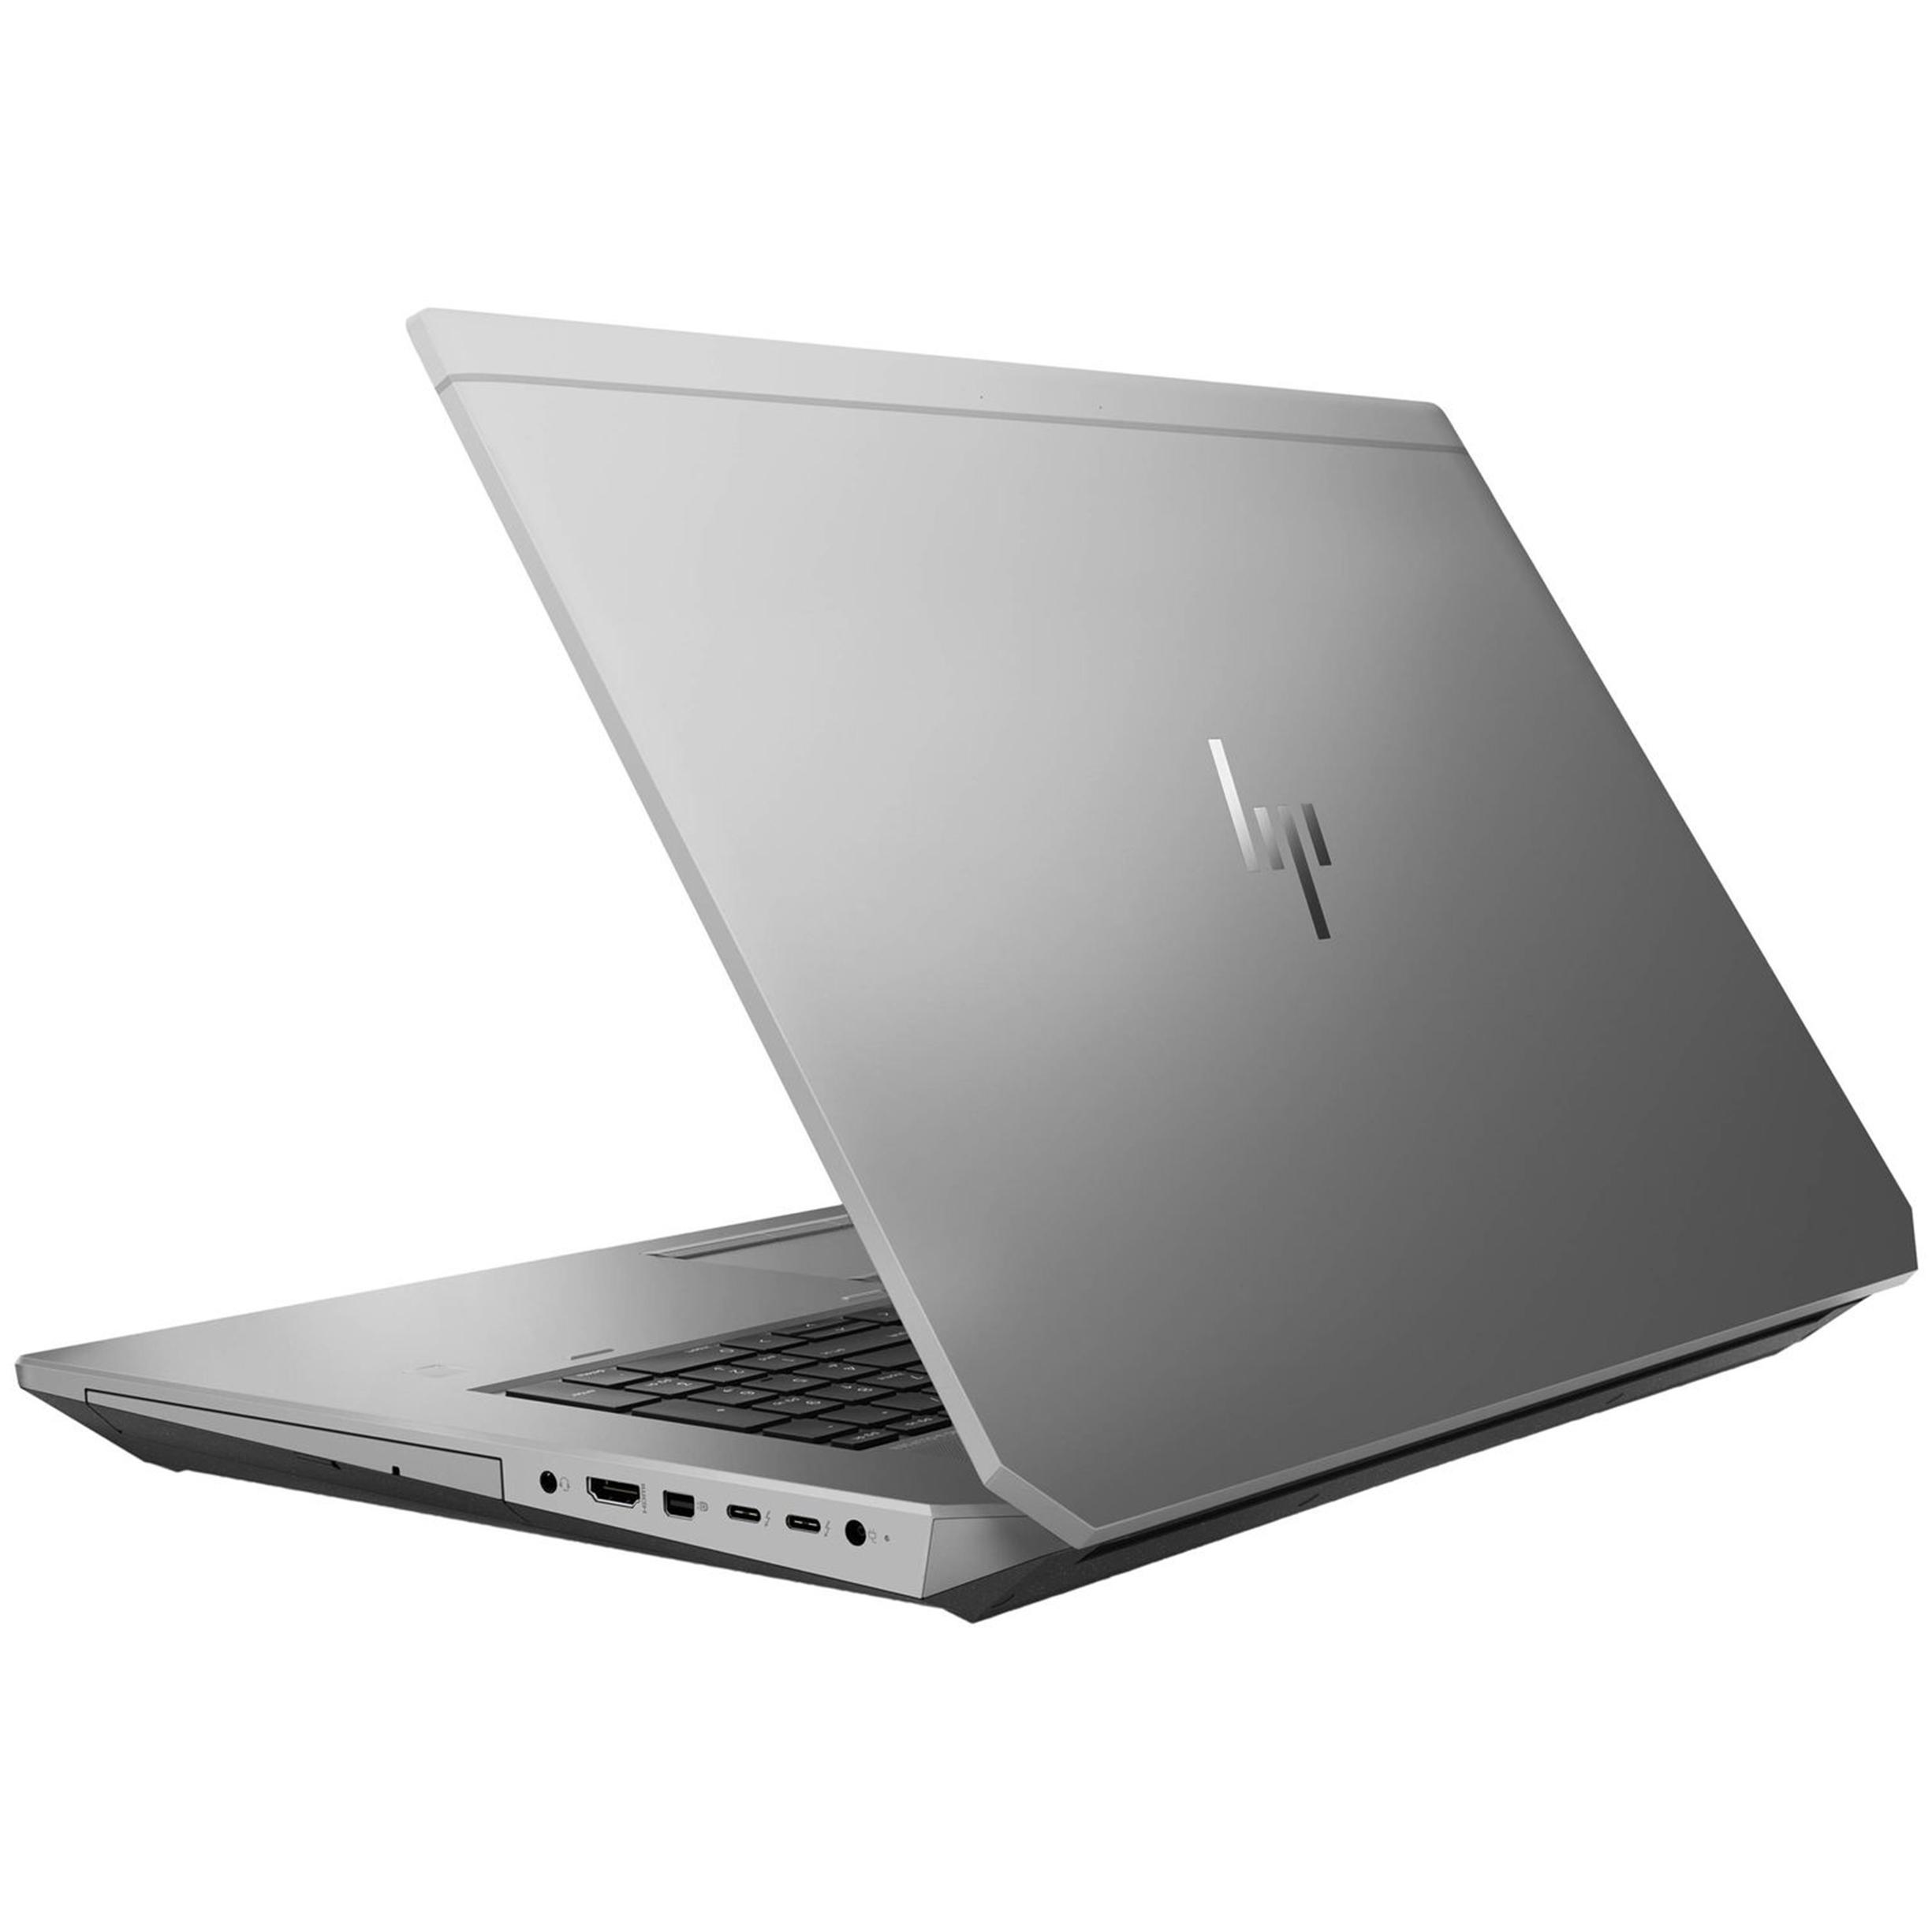 لپ تاپ 17 اینچی اچ پی مدل ZBook 17 G5 Mobile Workstation-F2